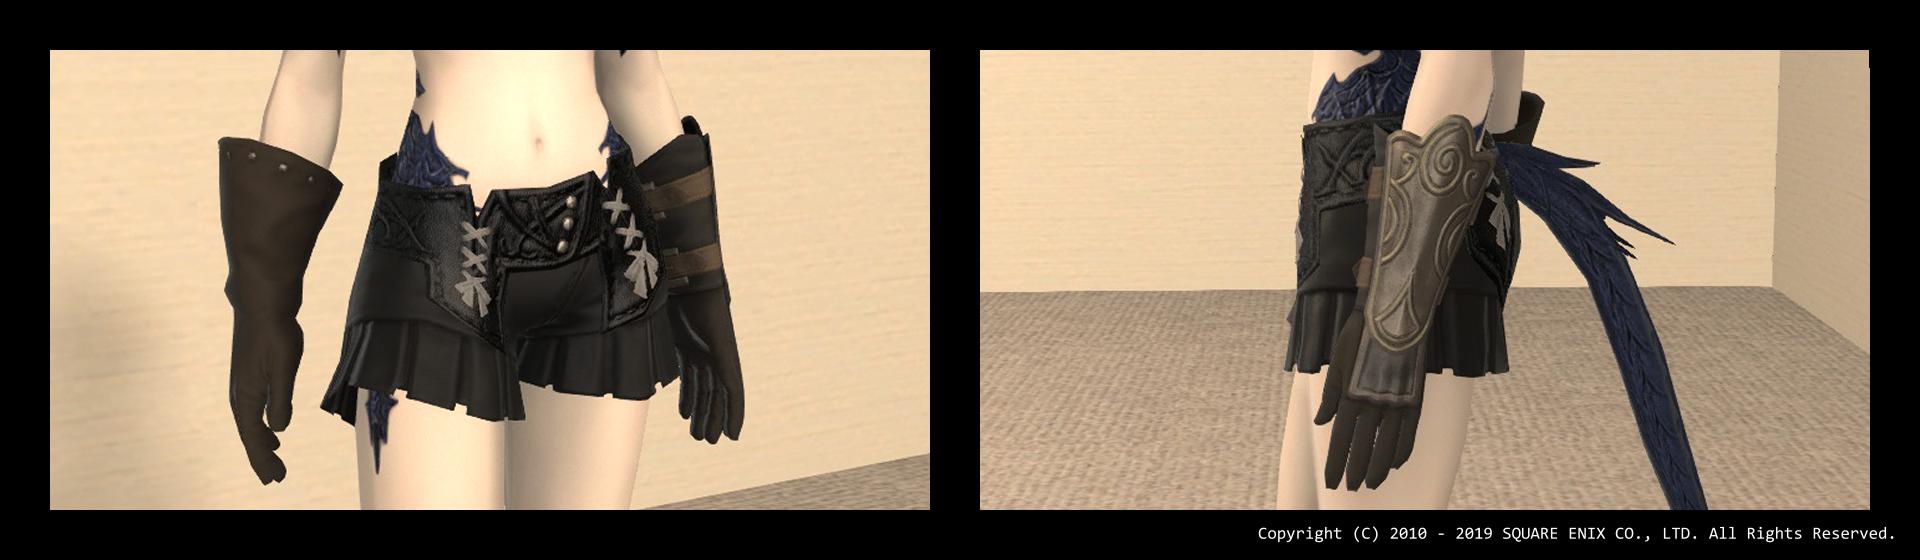 395c-mnksam-hands